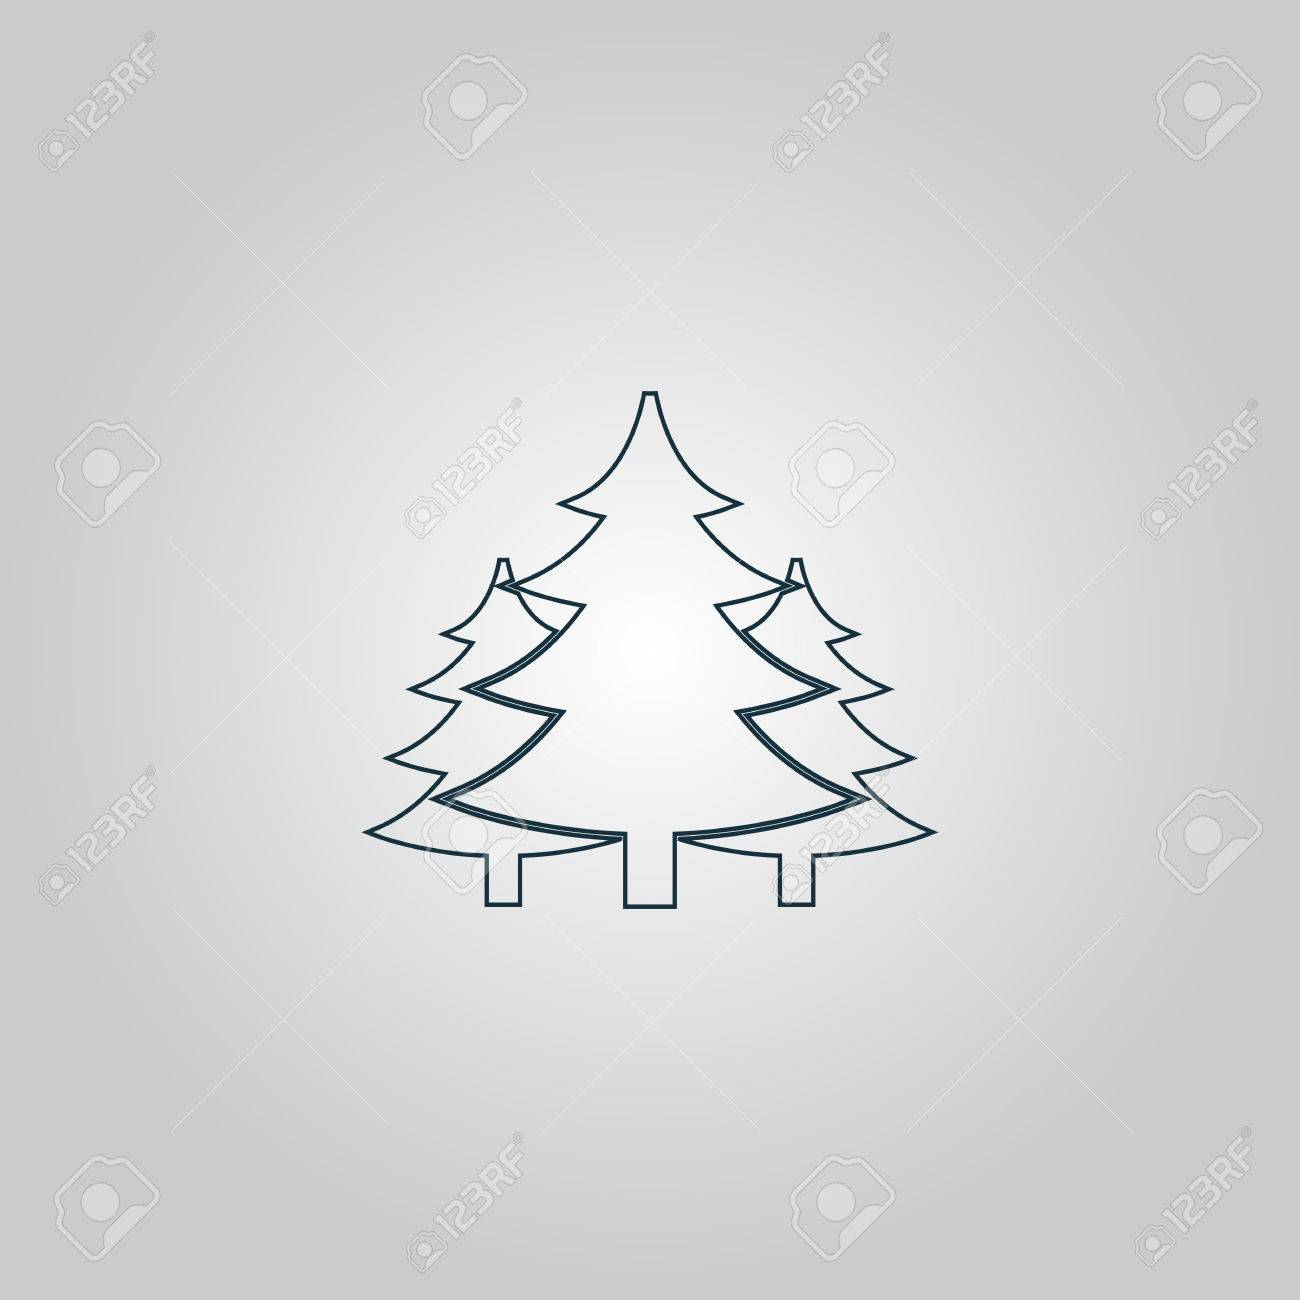 Grey Christmas Tree Tree Christmas Fir Tree Flat Web Icon Or Sign Isolated On Grey